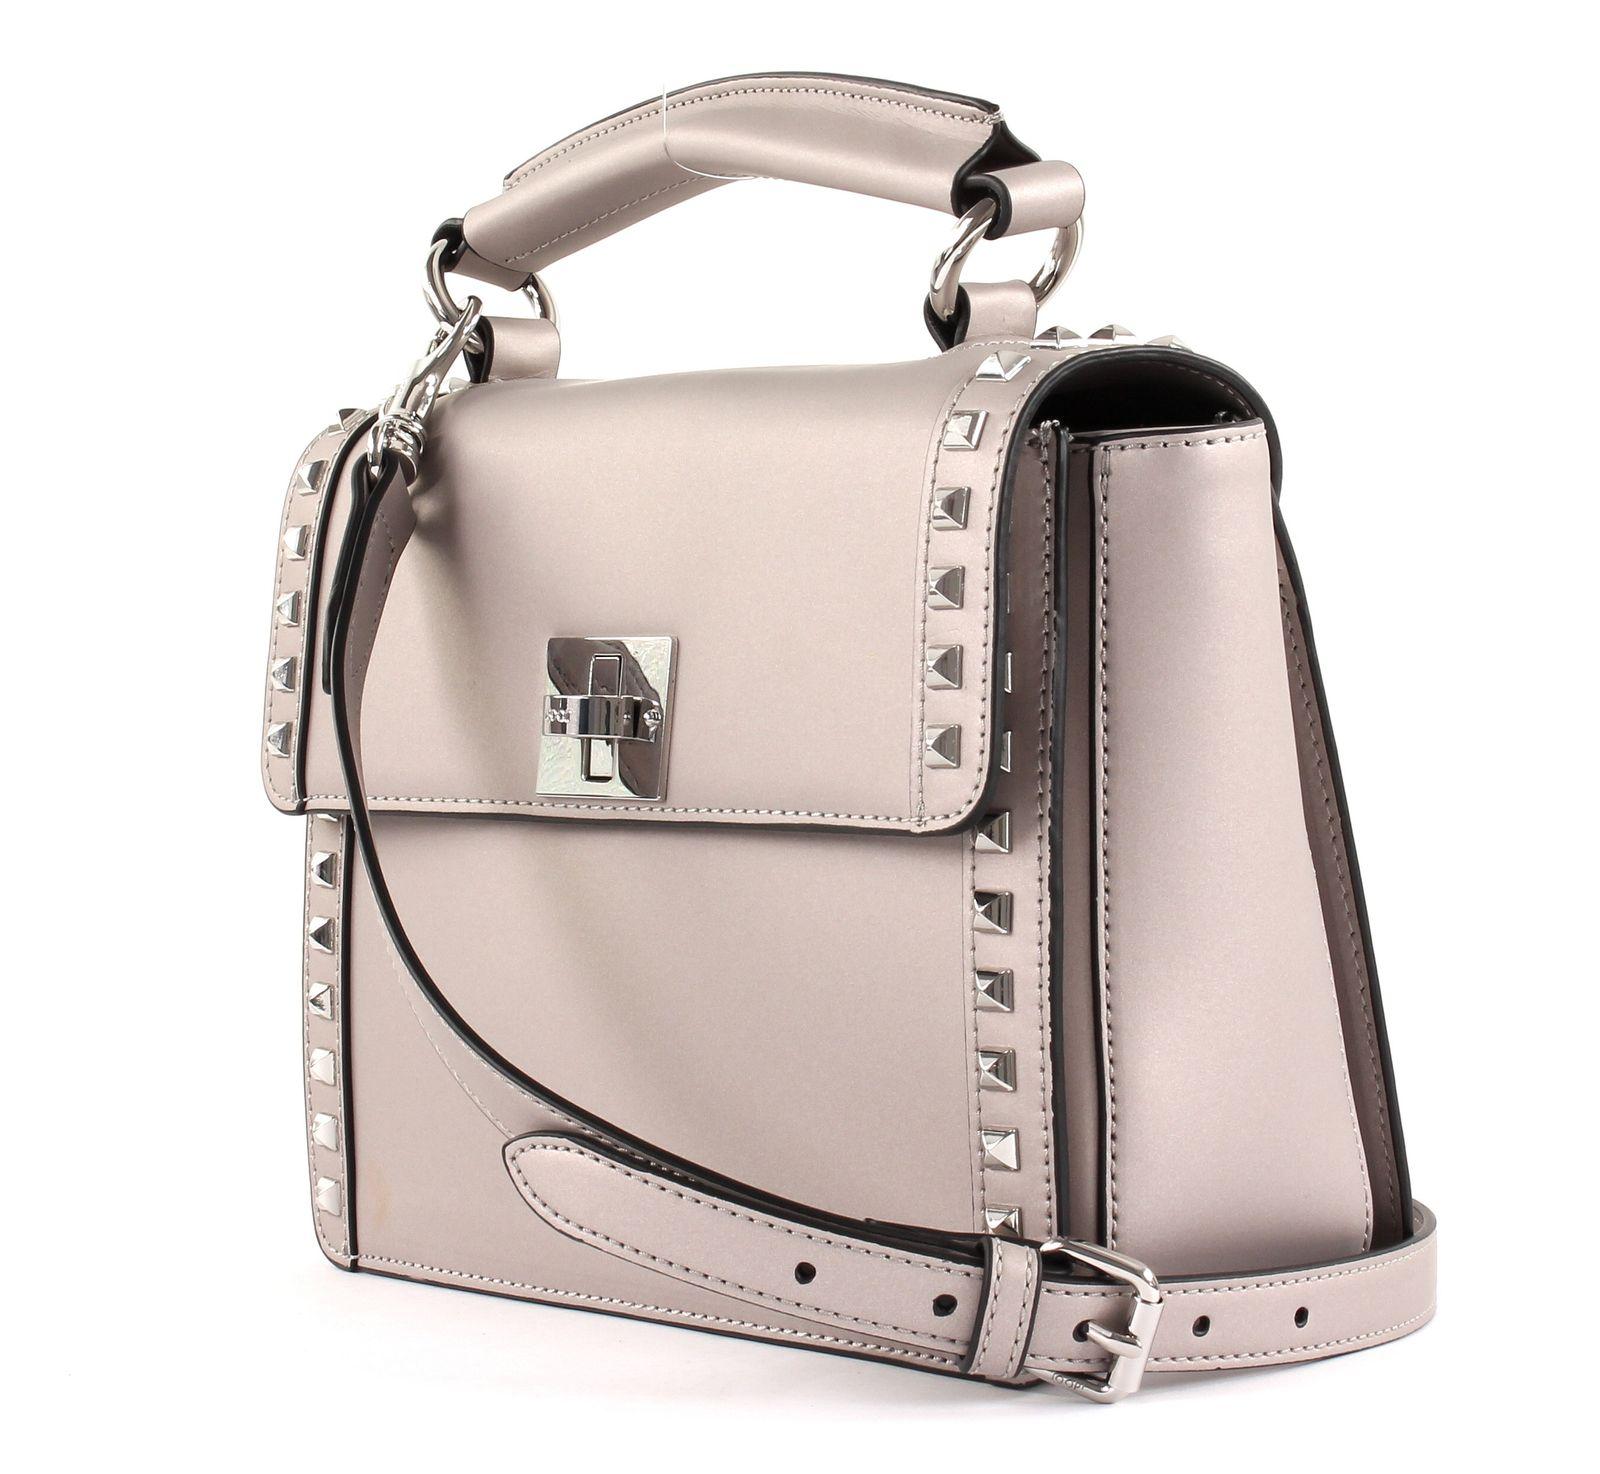 lebendig und großartig im Stil Turnschuhe Outlet-Verkauf JOOP! Sonora Kiara Handbag SHF Silver